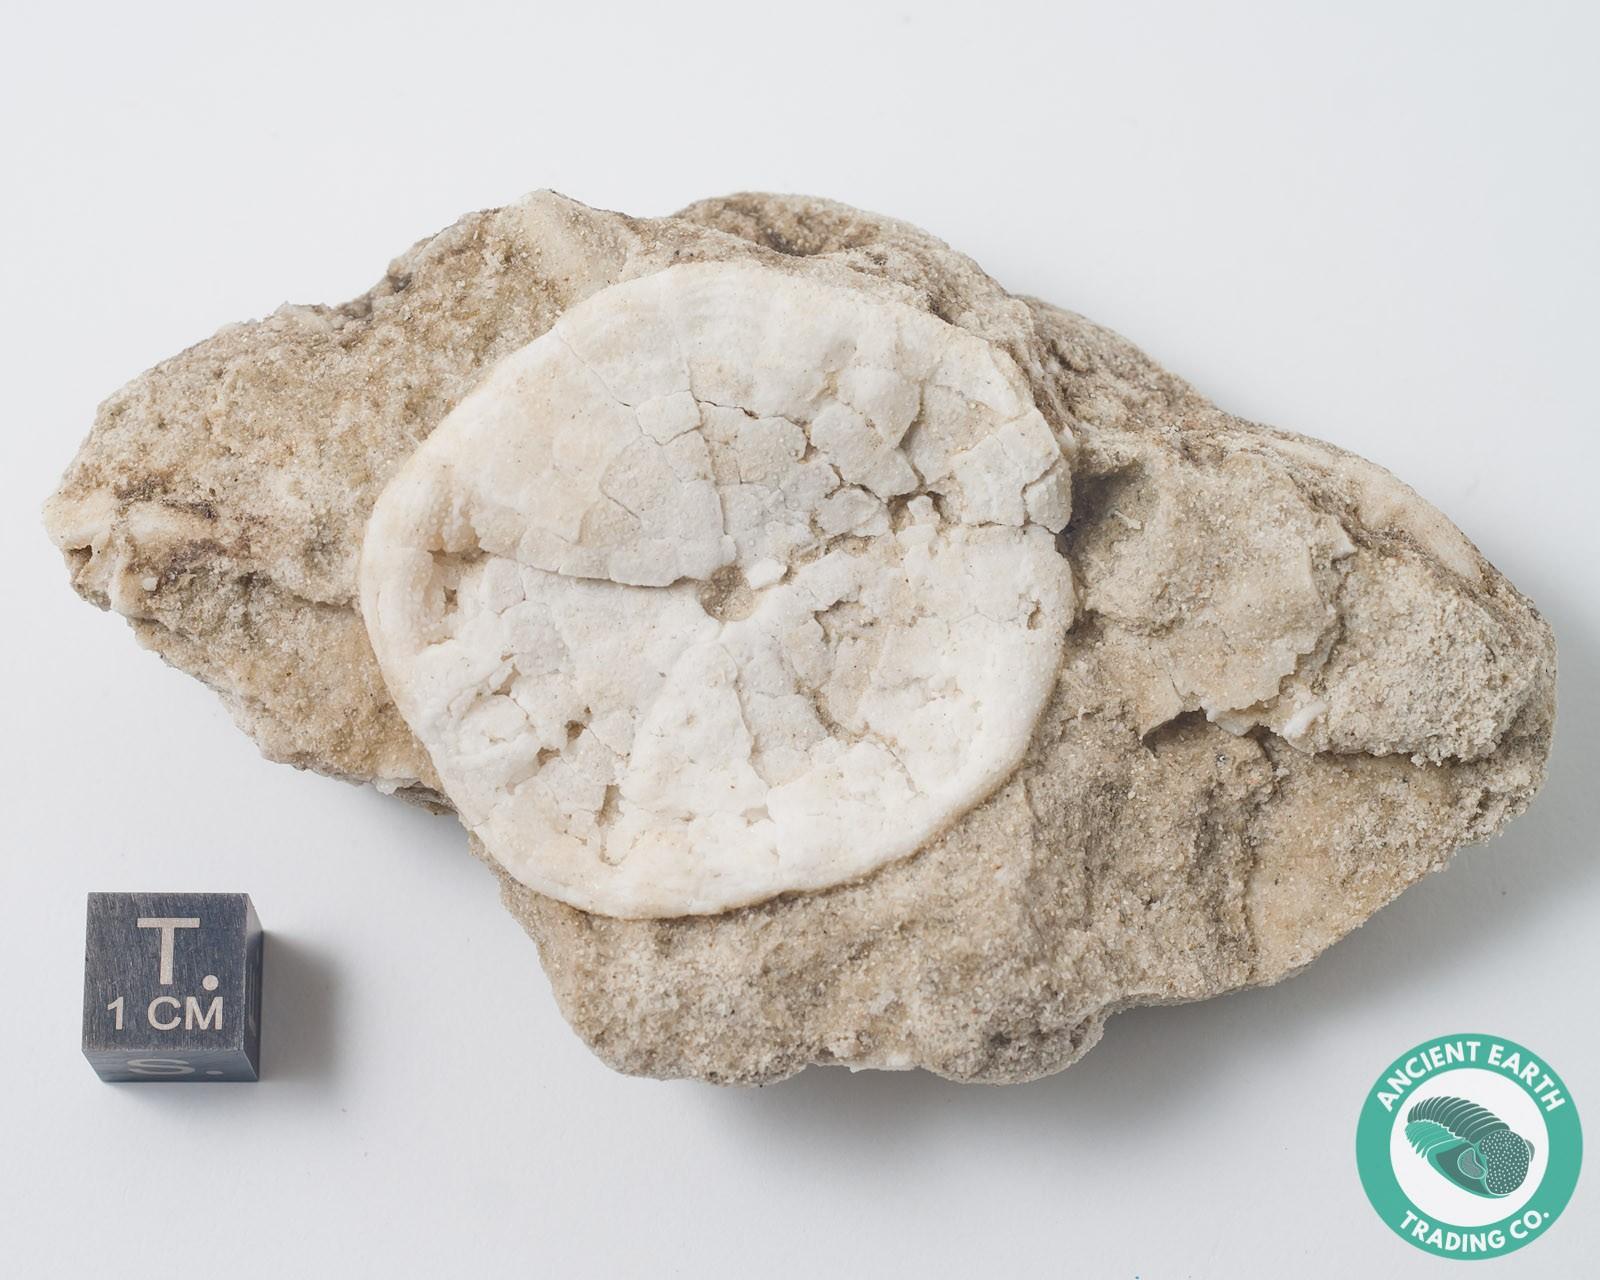 Large Sand Dollar Fossil Astrodapsis antiselli - California